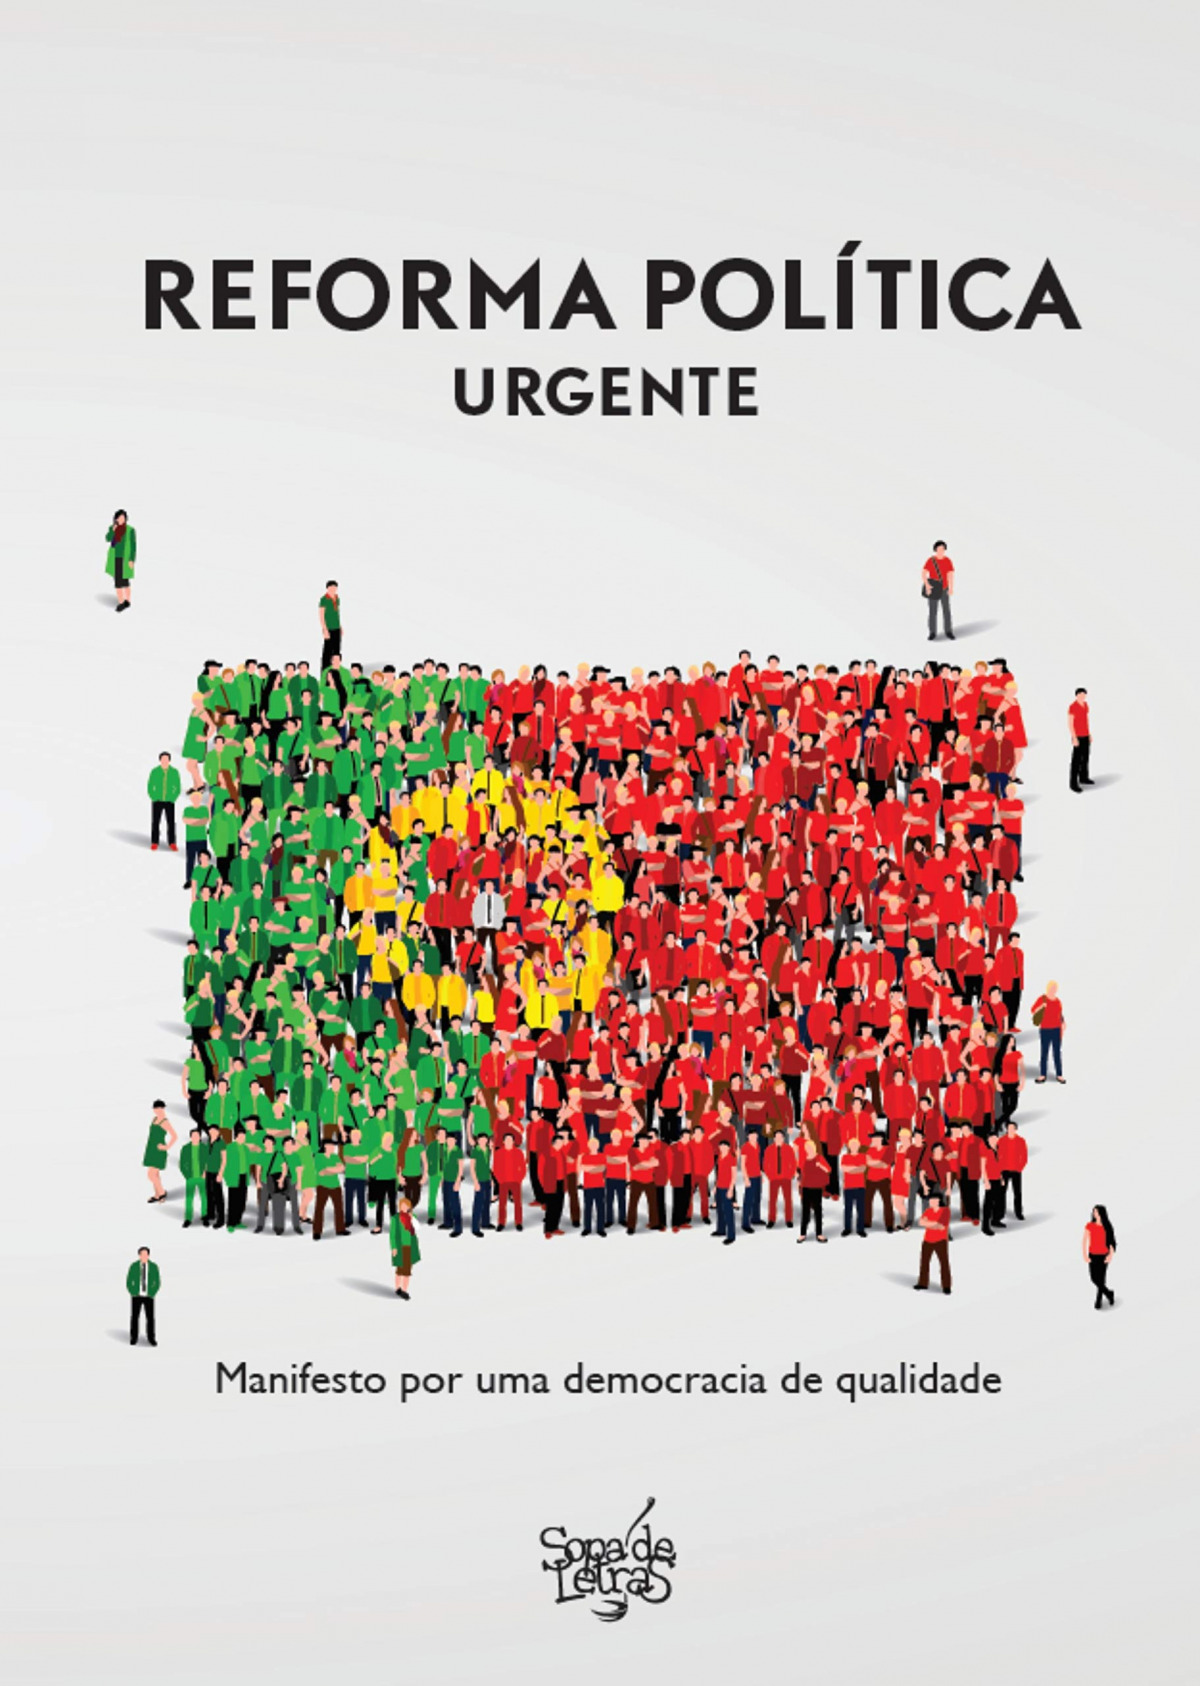 Reforma política urgente